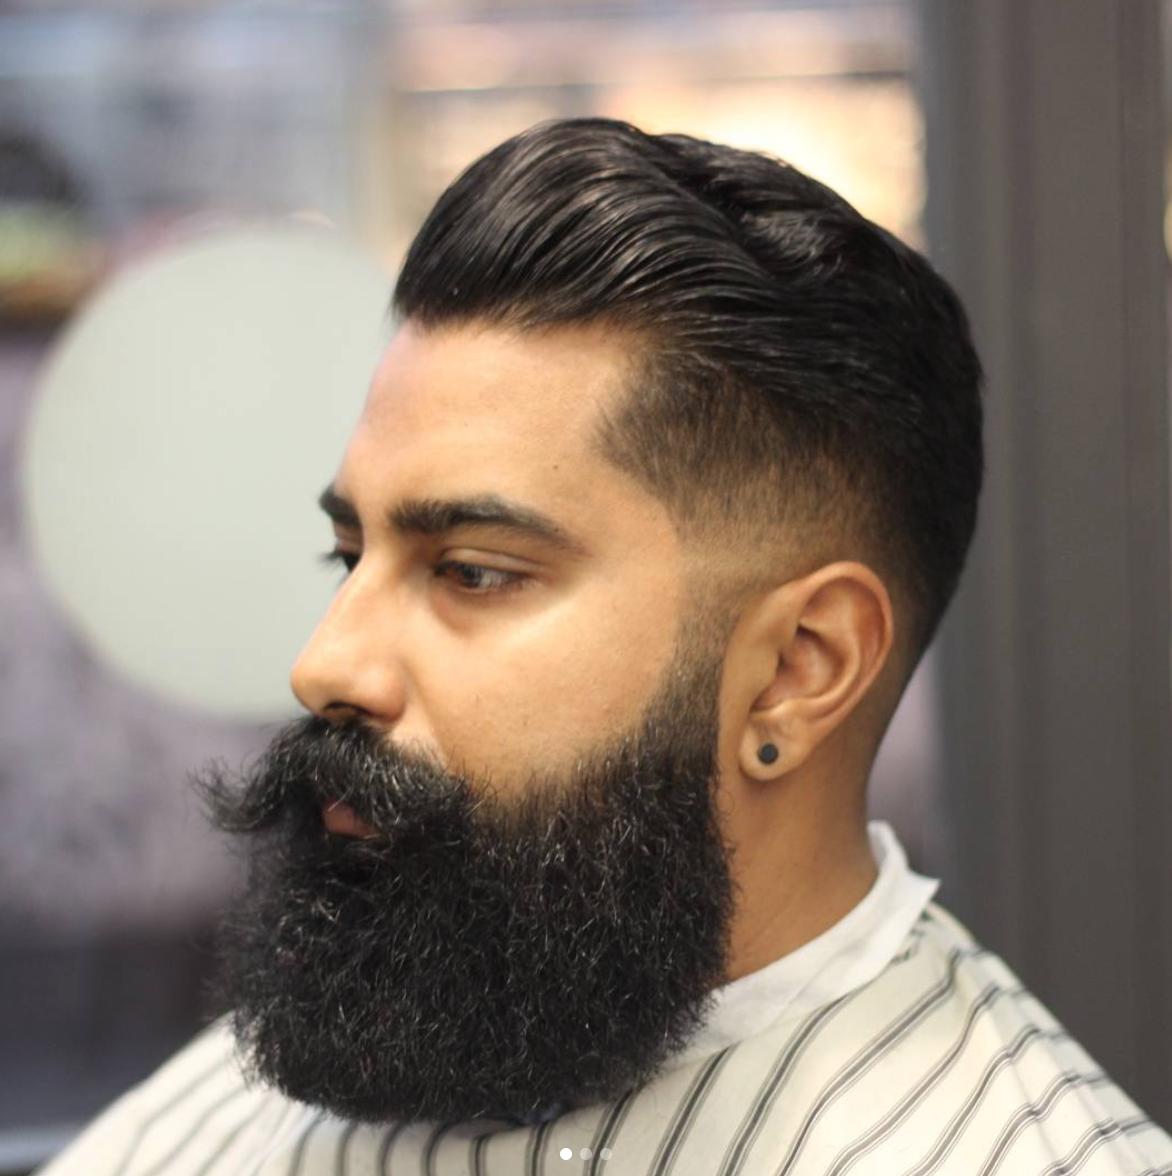 Style Cut & Beard Trim